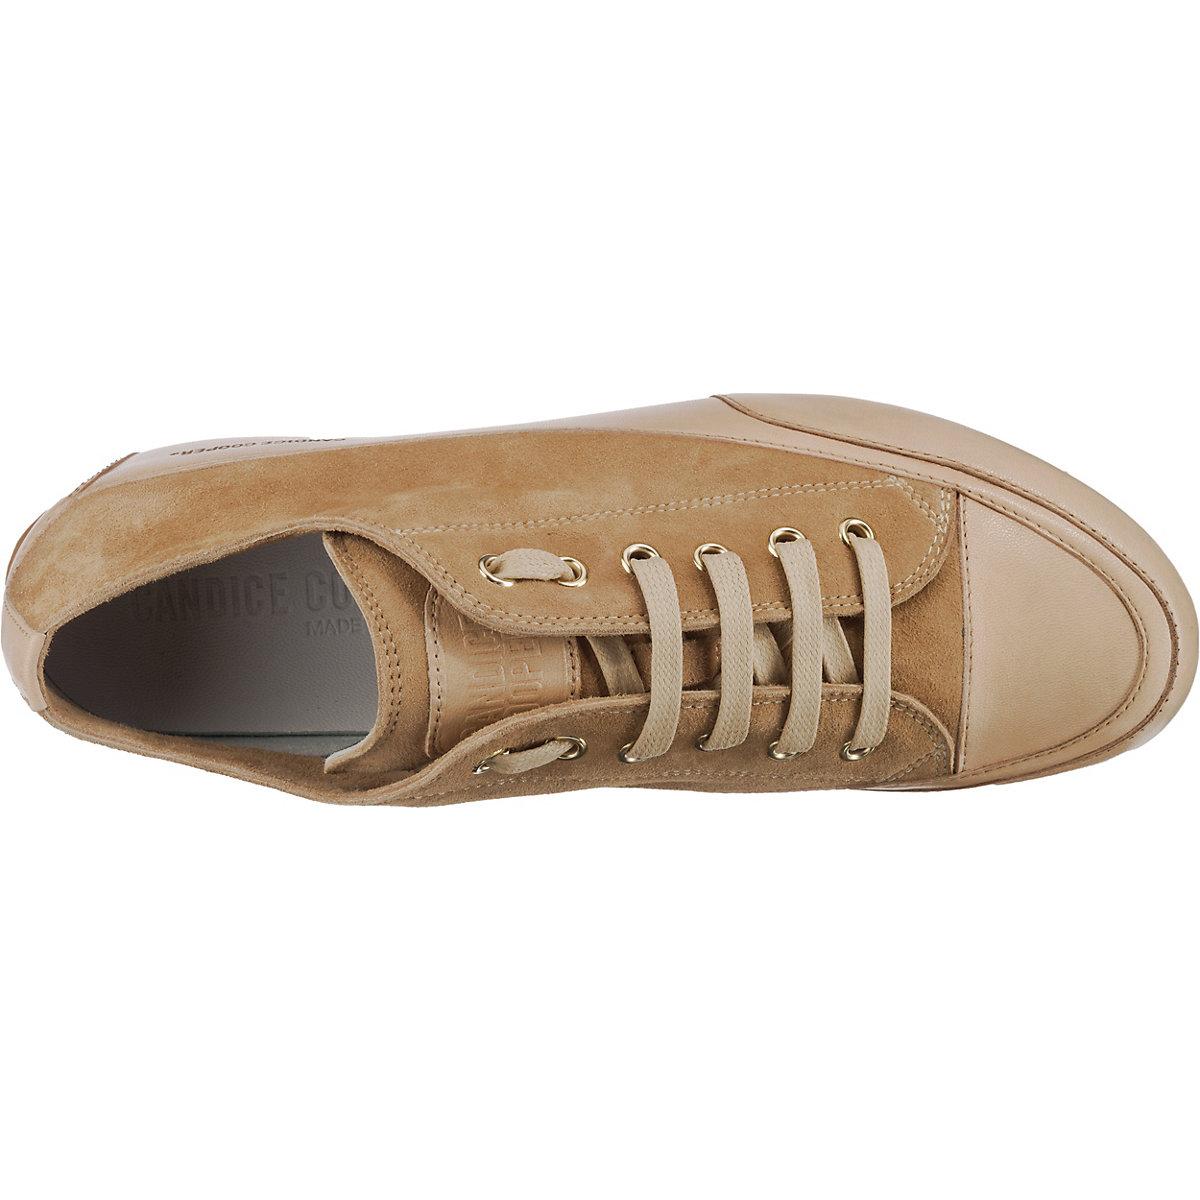 Candice Cooper, Rock Sneakers Low, Braun